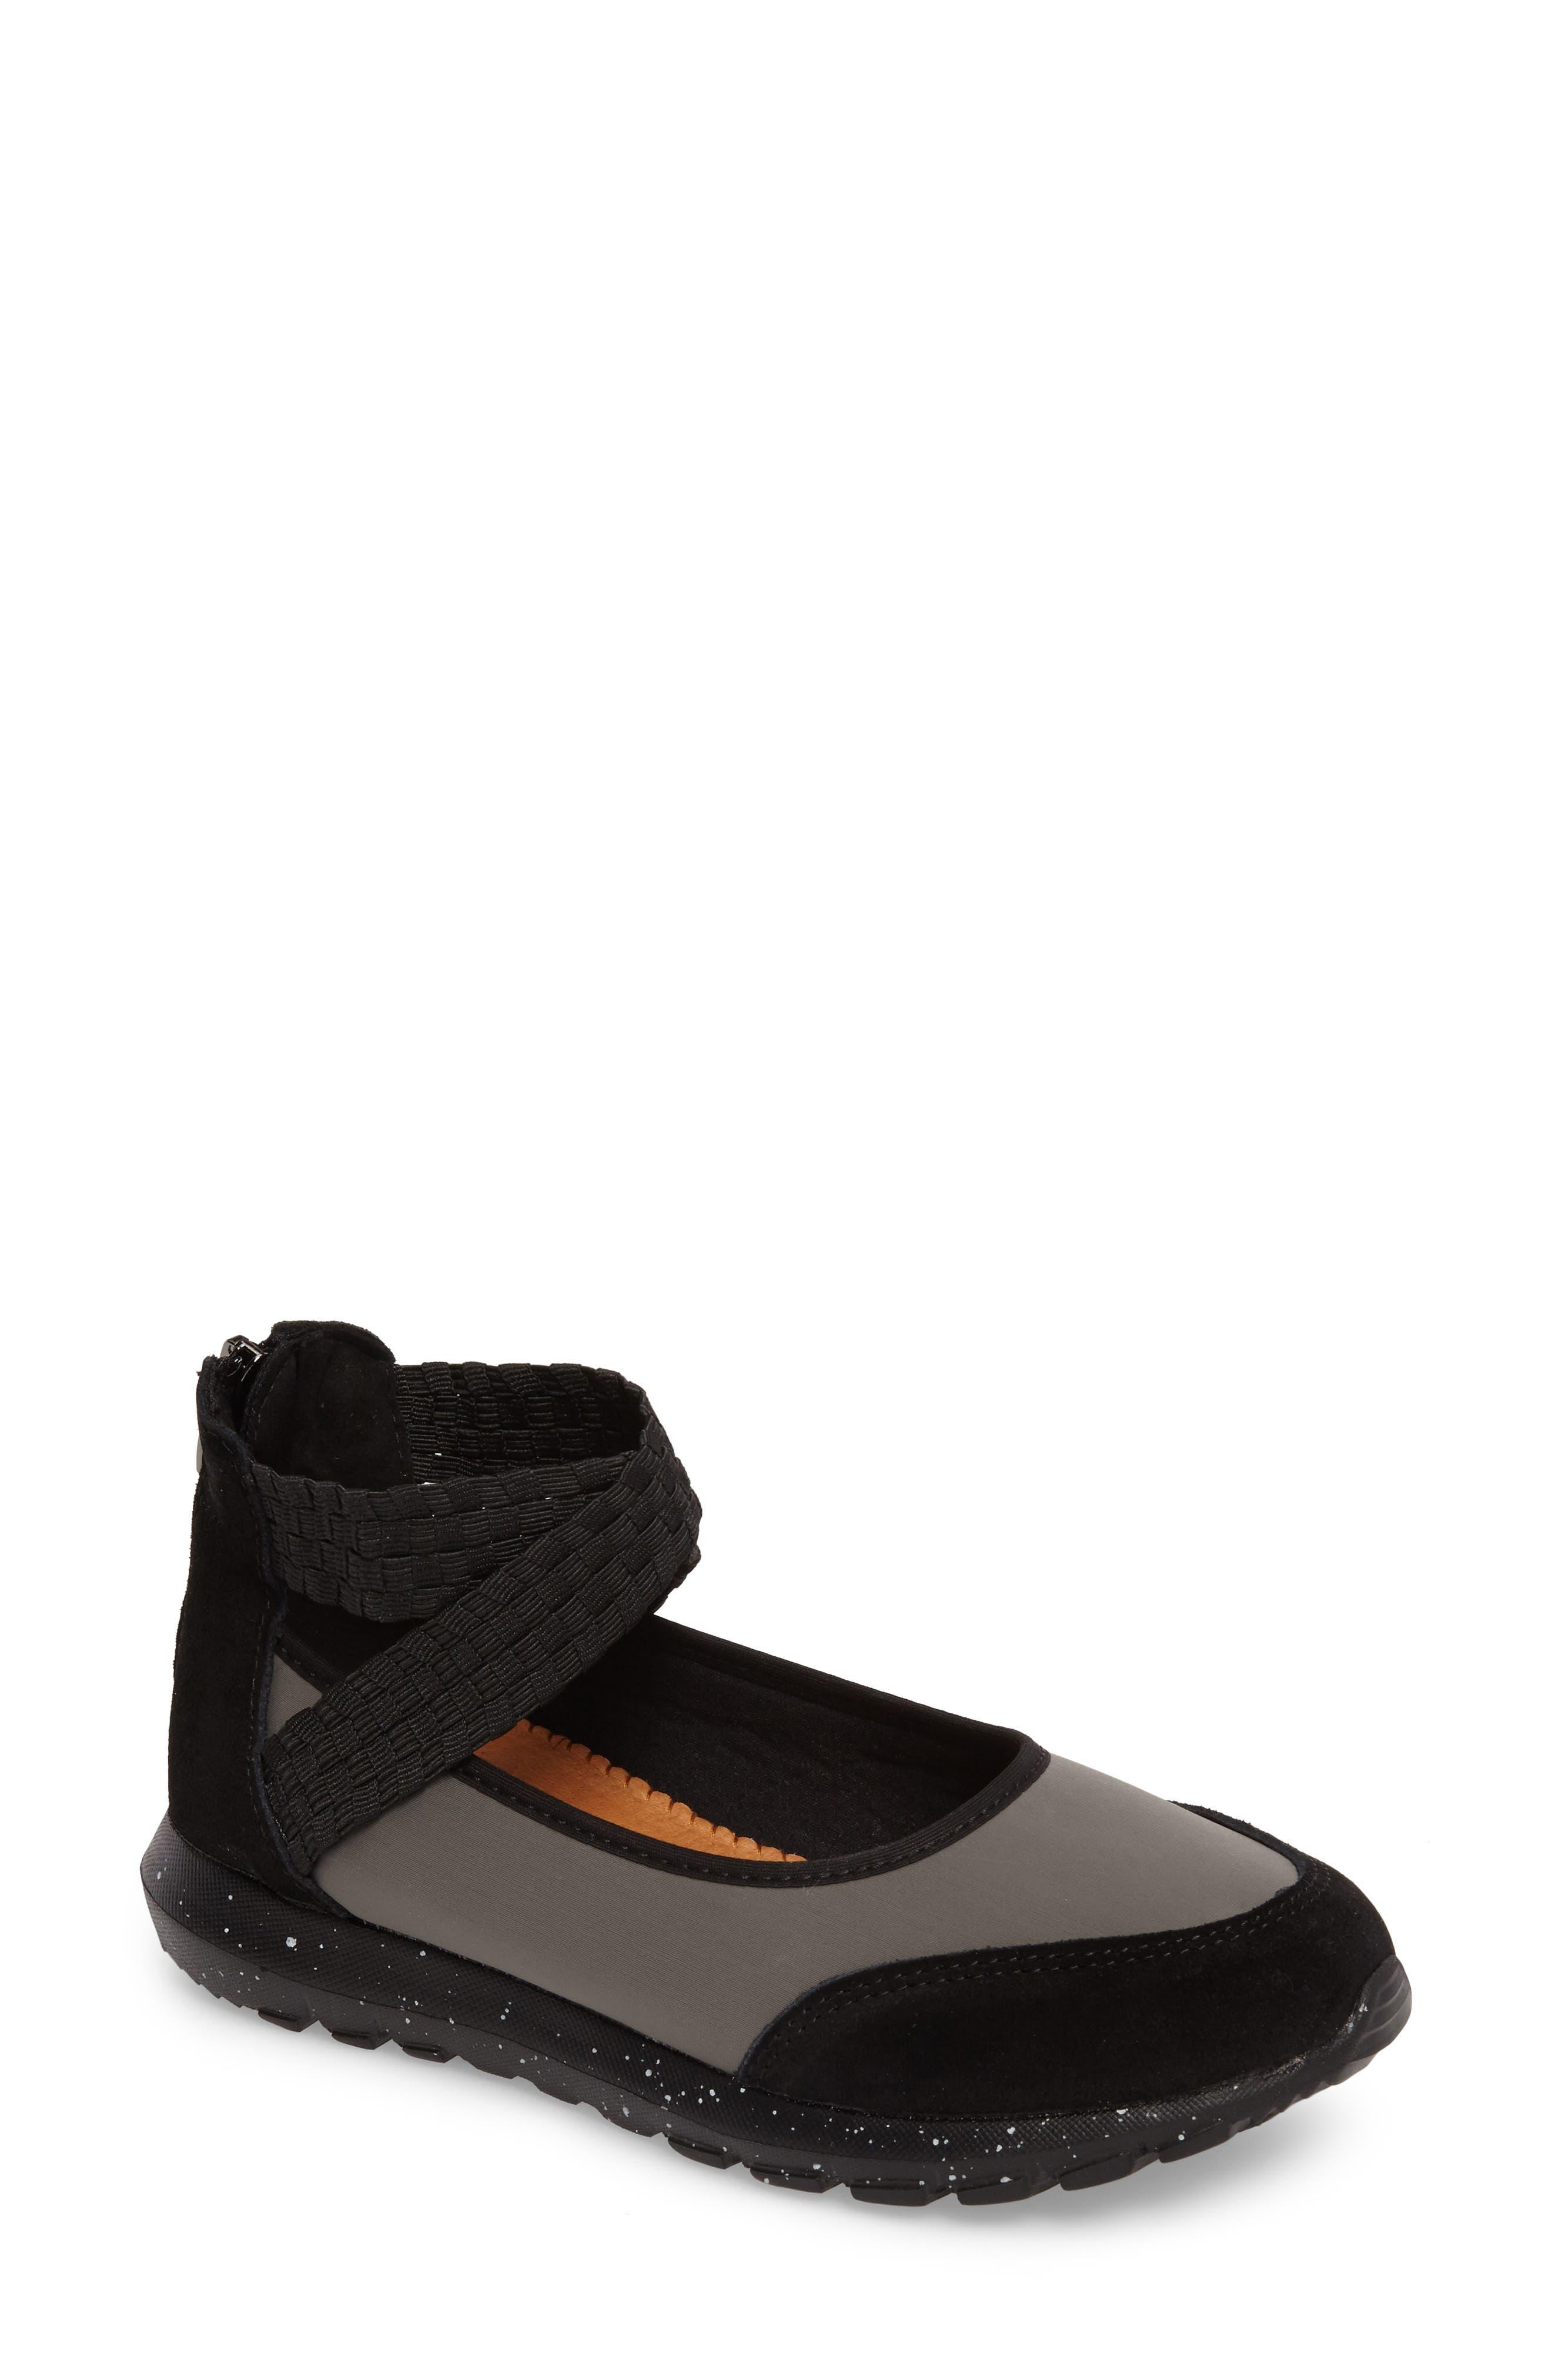 Alternate Image 1 Selected - Bernie Mev Runner Flow Sneaker (Women)